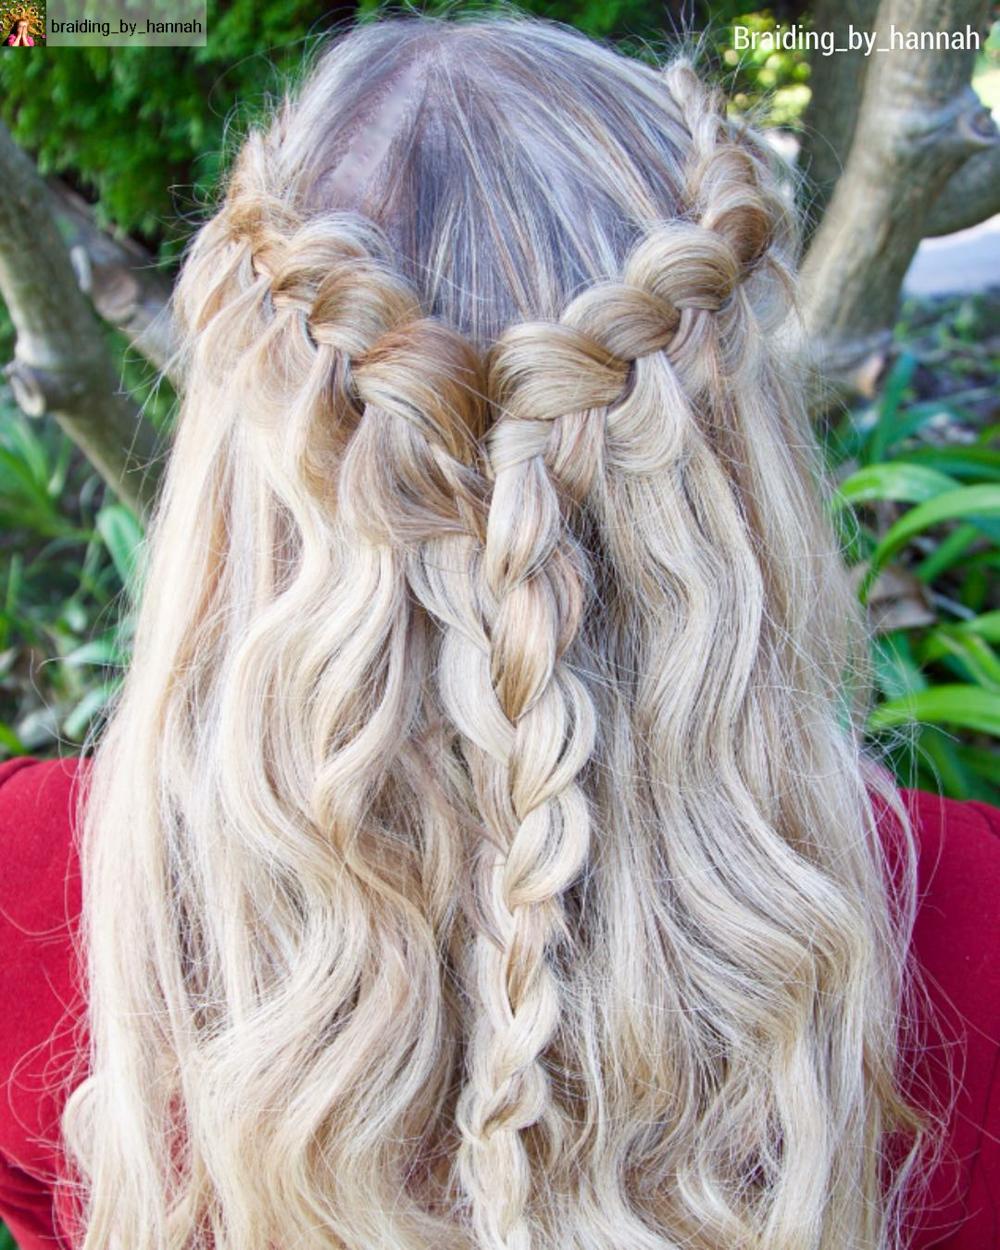 braid by Hannah.jpg